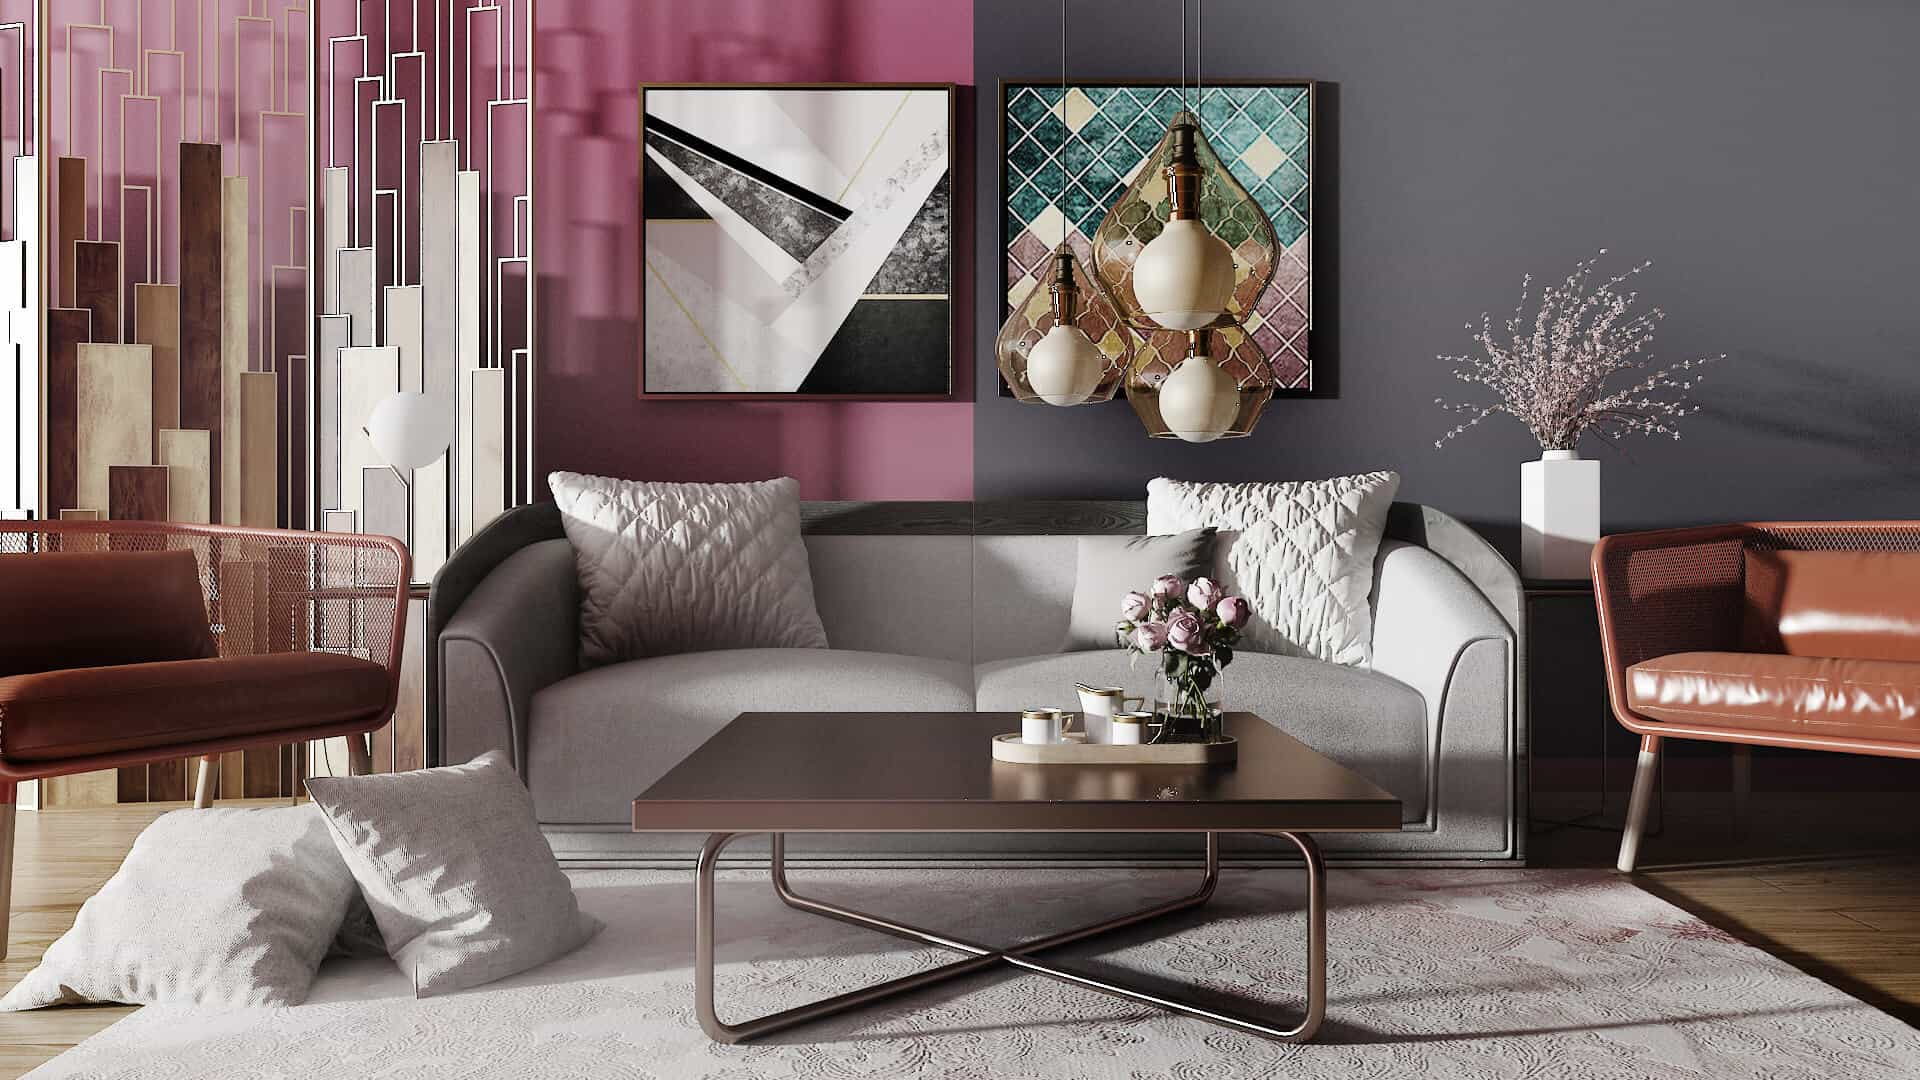 20 amazing interior design ideas to try in 20 – Rockabye Organics